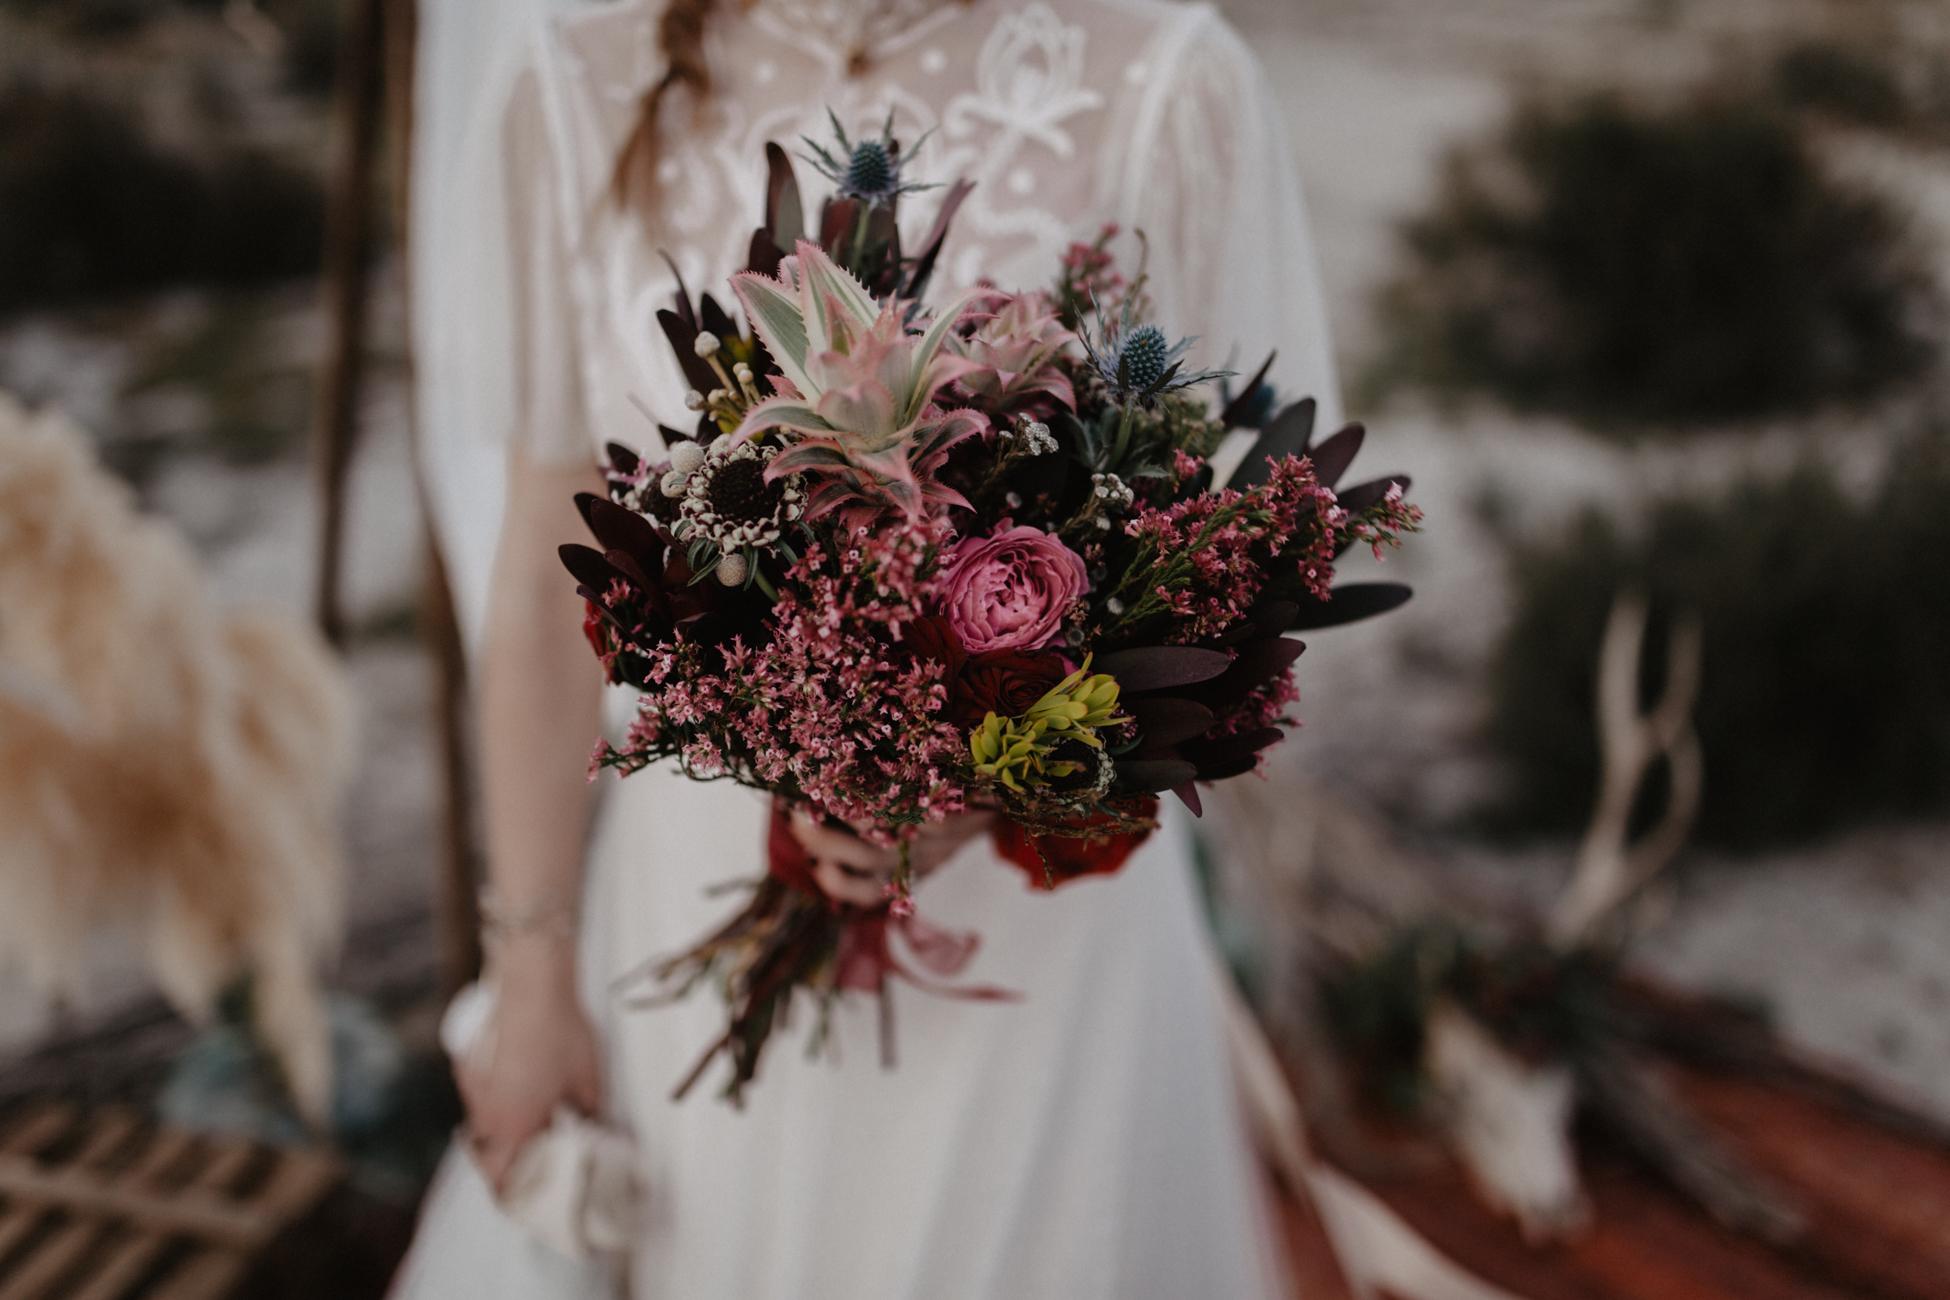 thenortherngirlphotography_photography_thenortherngirl_rebeccascabros_wedding_weddingphotography_weddingphotographer_wood_muebles_deco_bodasdecaramelo_home_bedtime_gaywedding_editorial_desierto_desert_wildestdreams_amortexano-444.jpg